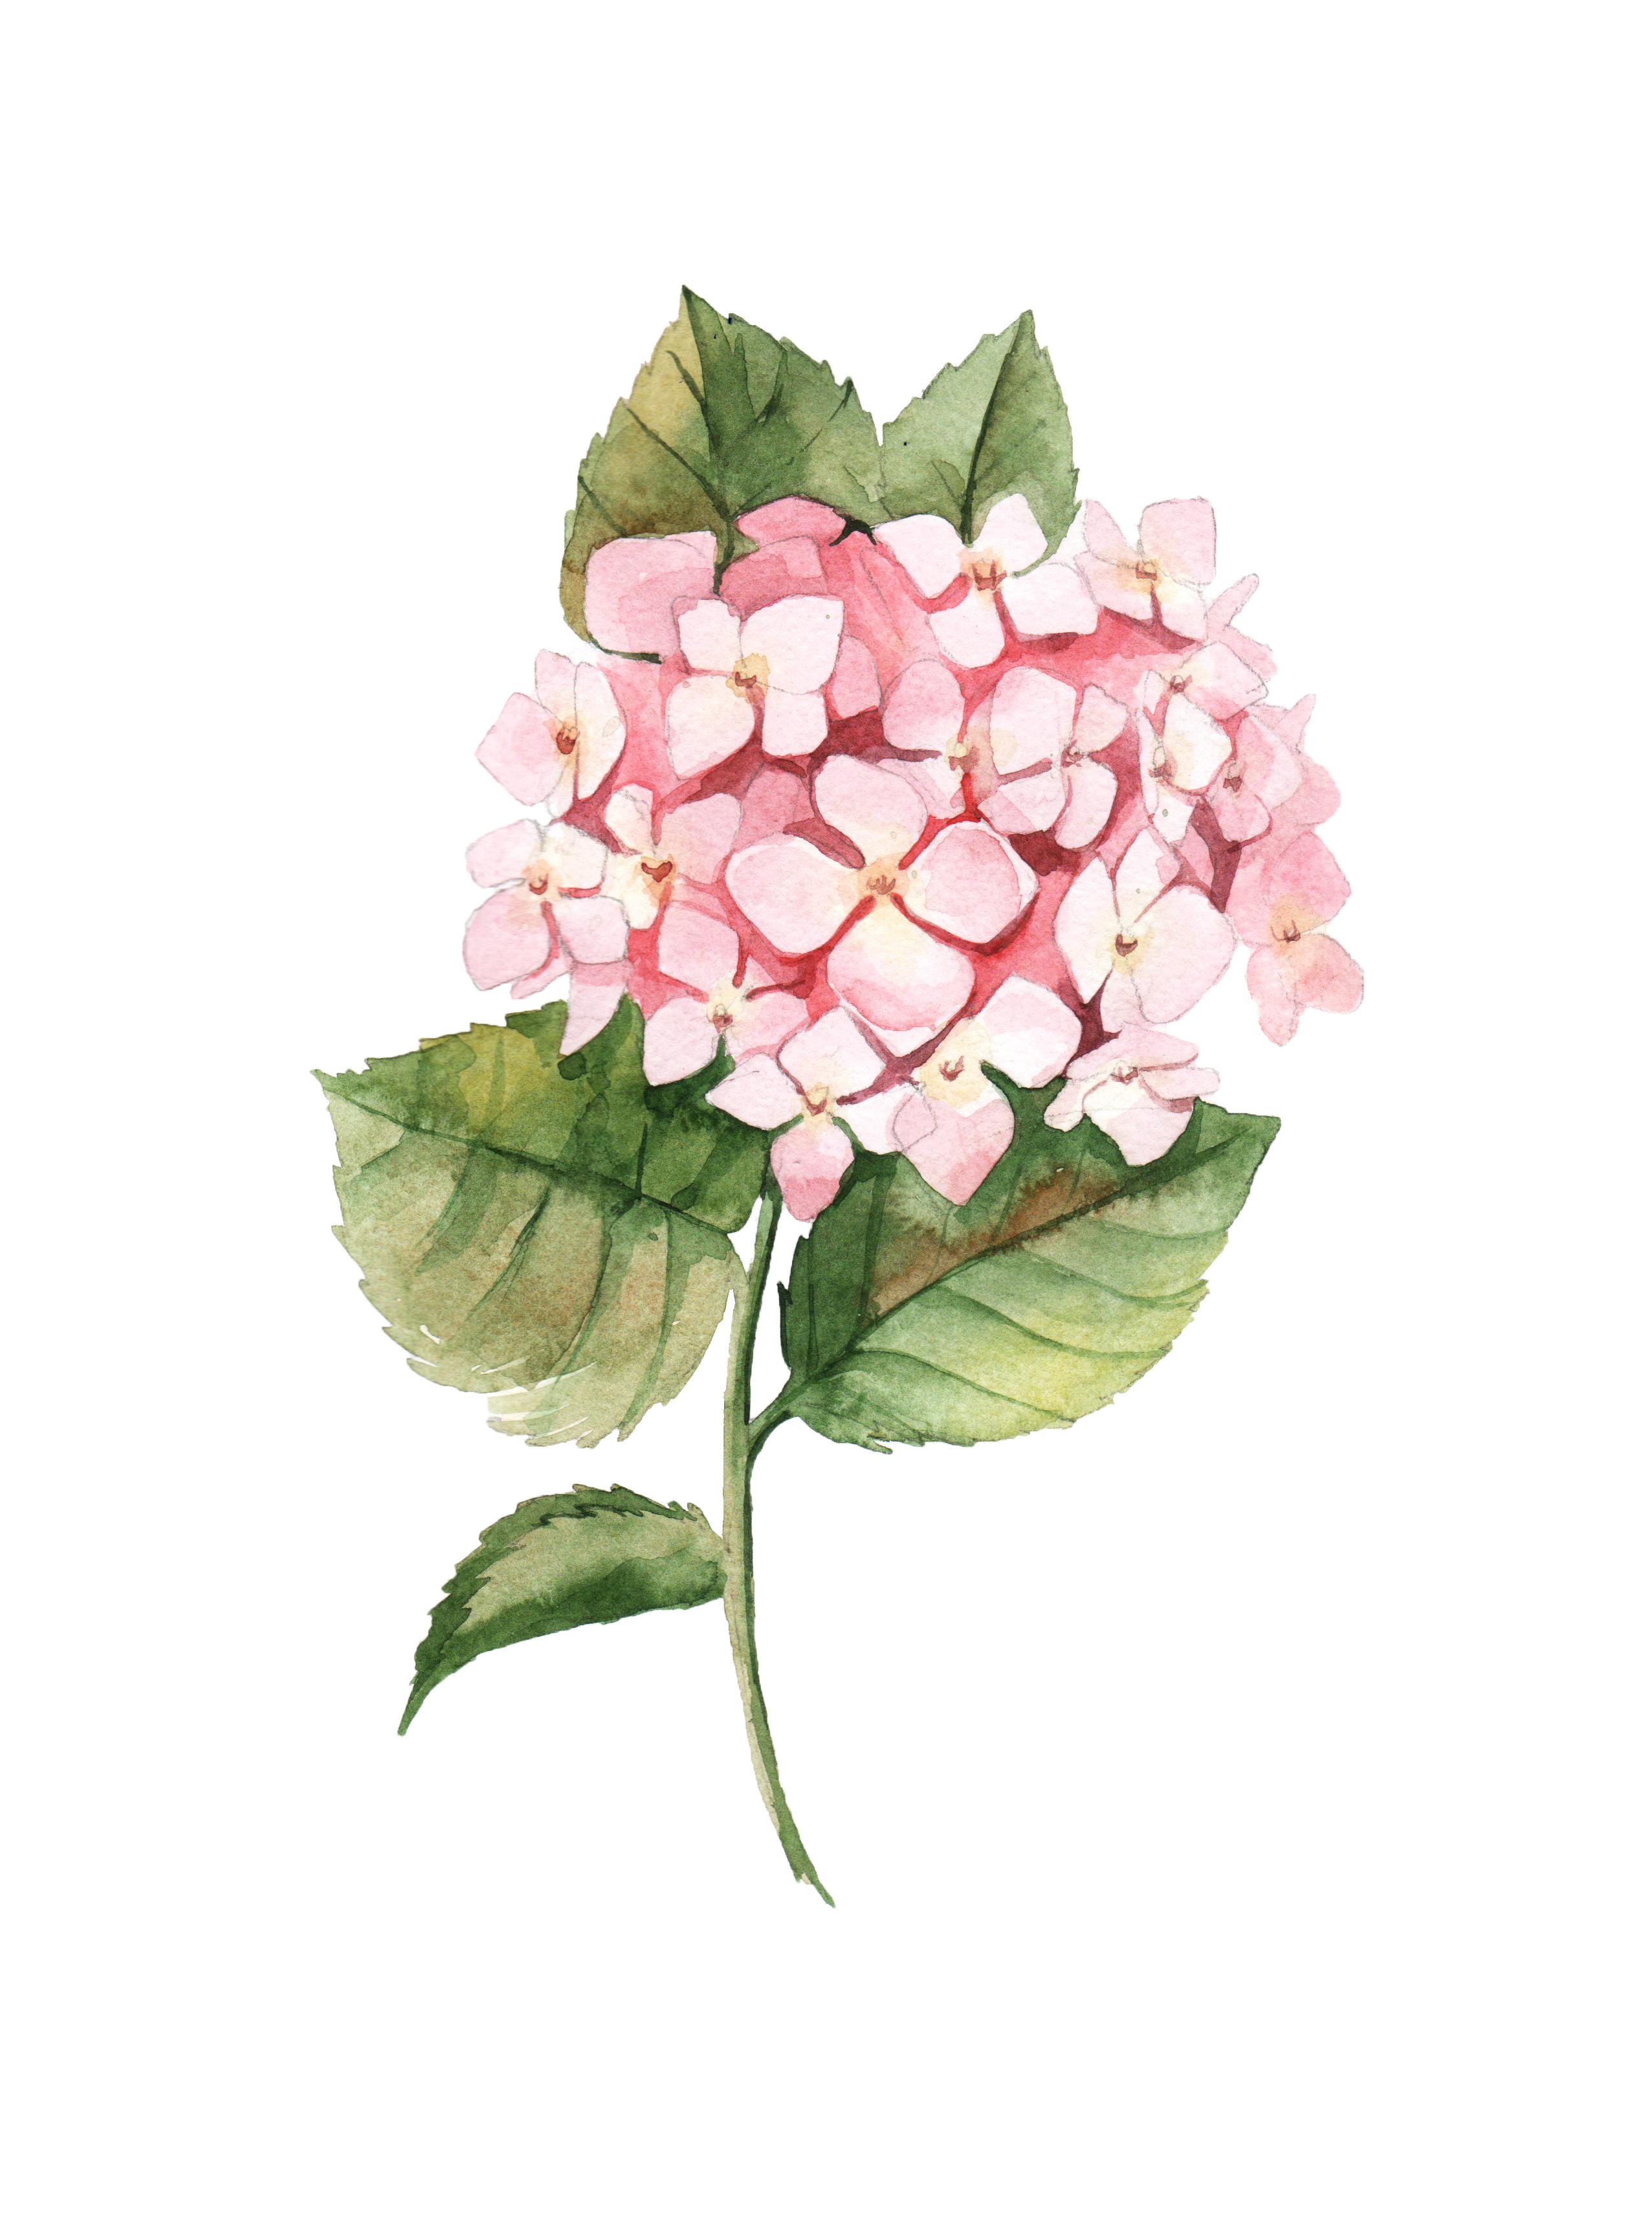 2553x3429 Watercolor Botanical Drawing By Aleksandra Goga